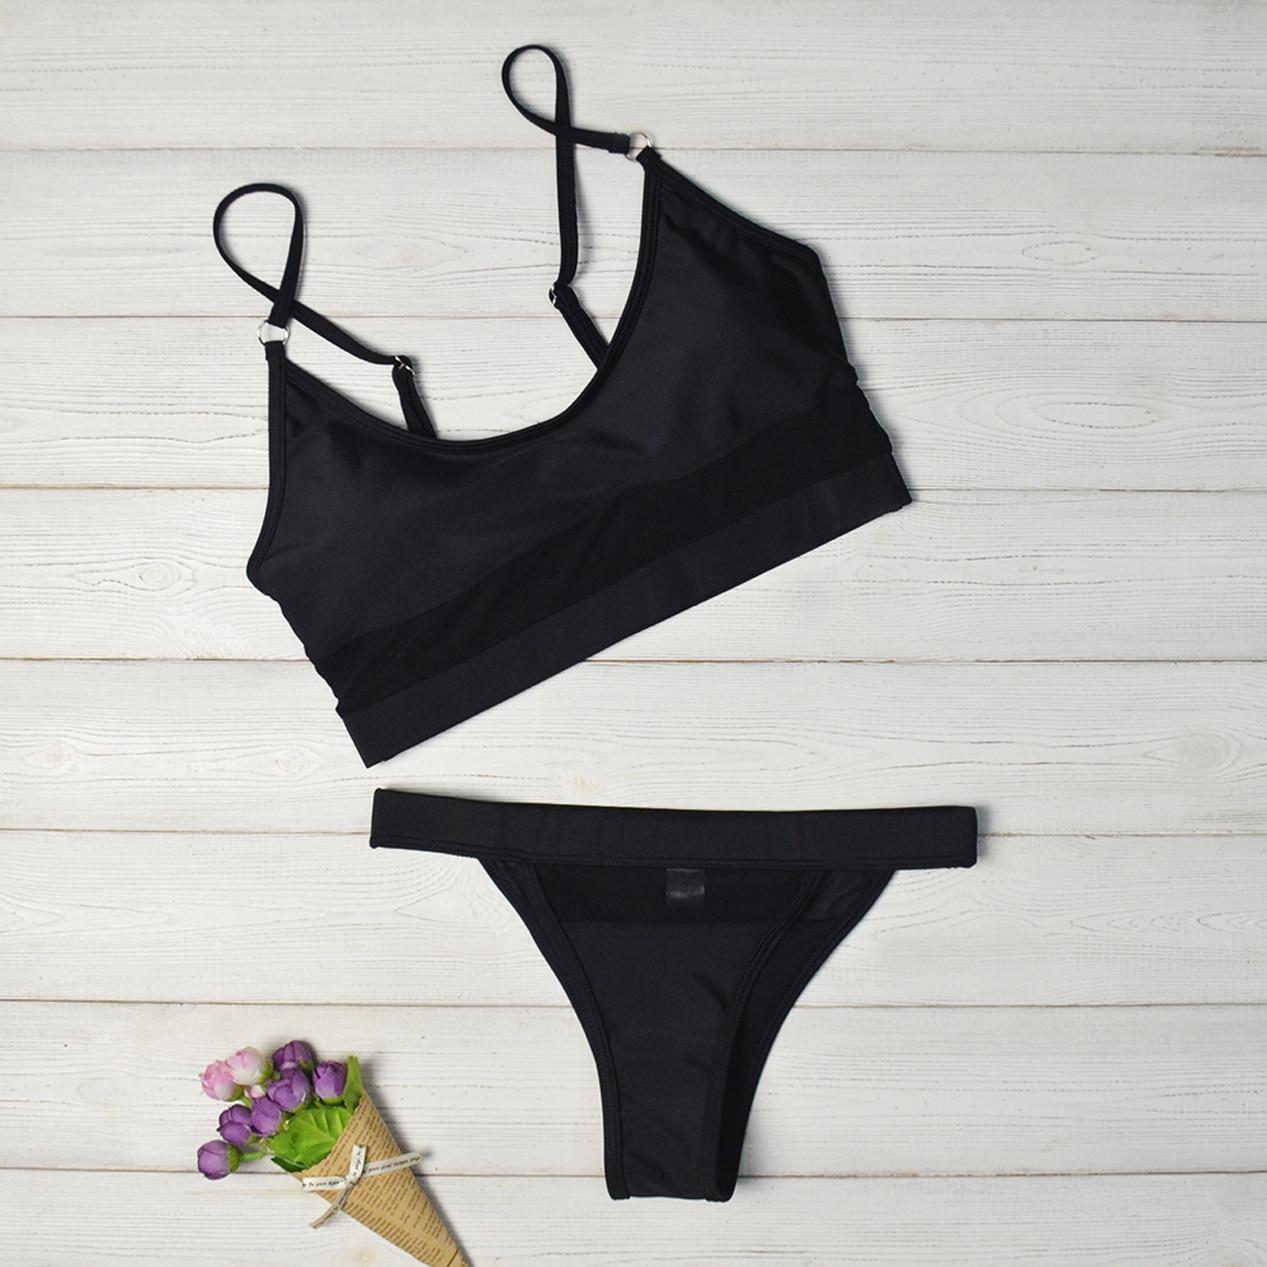 Push Up Mesh Bikini Swimwear Women 2019 Sexy Swimsuit Mesh Micro Thong Brazilian Bikini See Through Women Bathing Suit Biquinis in Bikinis Set from Sports Entertainment